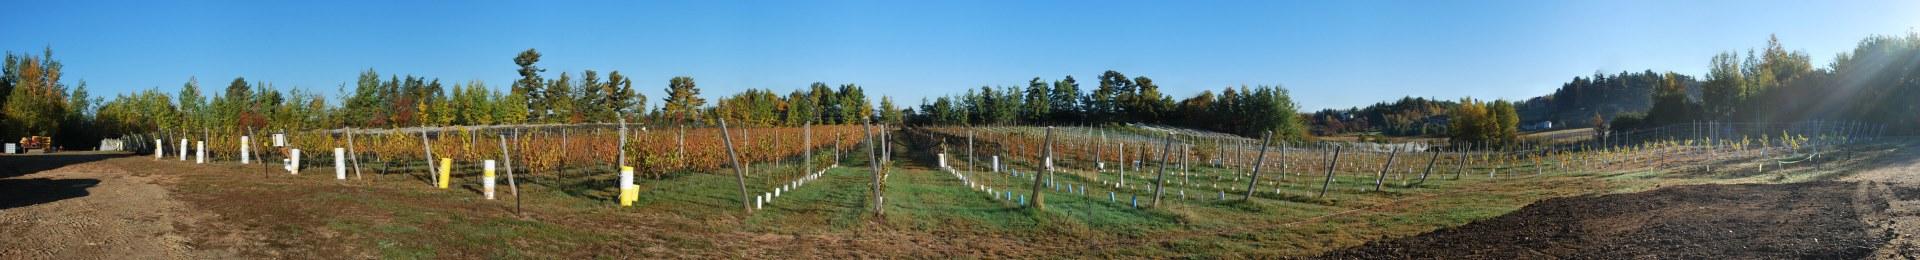 Domaine Latitude 46 Estate Winery